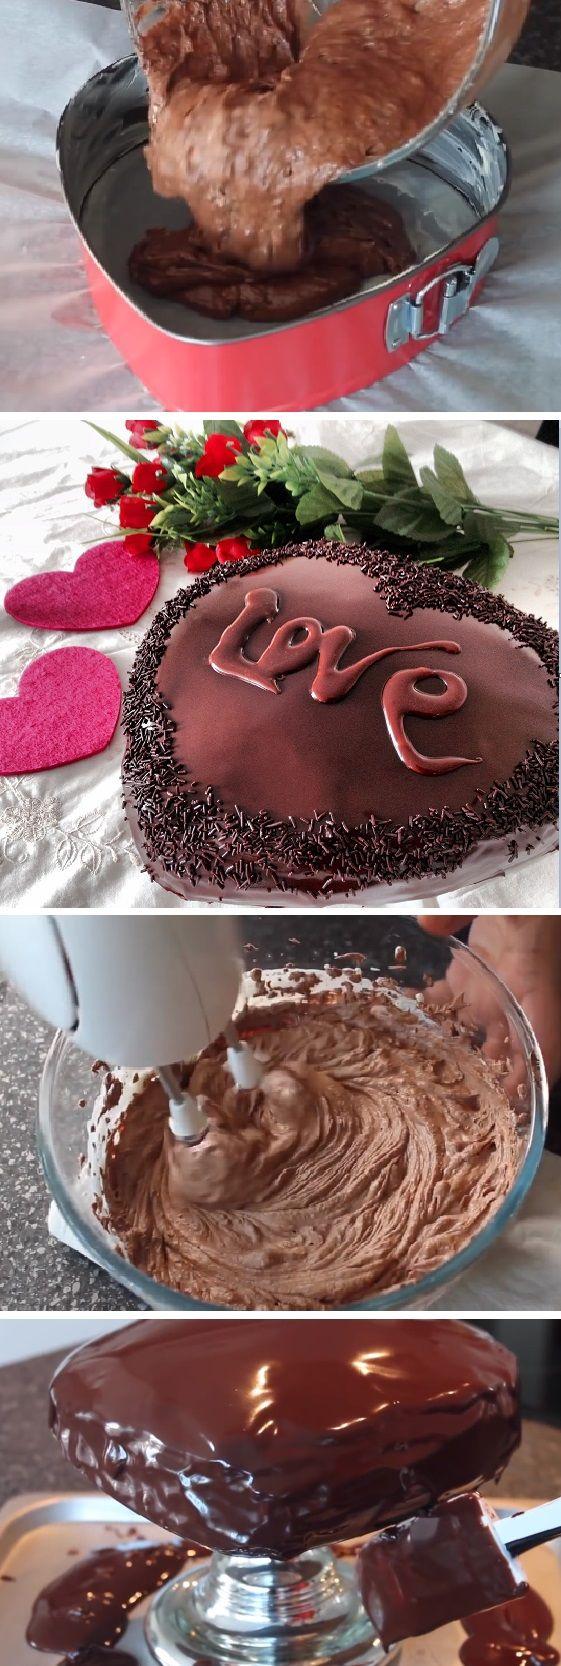 Tarta de chocolate y trufa Corazón de San Valentín, ¨Recetas románticas¨ #sanvalentin #valentinesday #valentine #love #azúcar #tips #cupcakes #cakes #dulces #receta #recipe #casero #torta #tartas #pastel #nestlecocina #bizcocho #bizcochuelo #tasty #cocina #chocolate #pan #panes Si te gusta dinos HOLA y dale a Me Gusta MIREN …